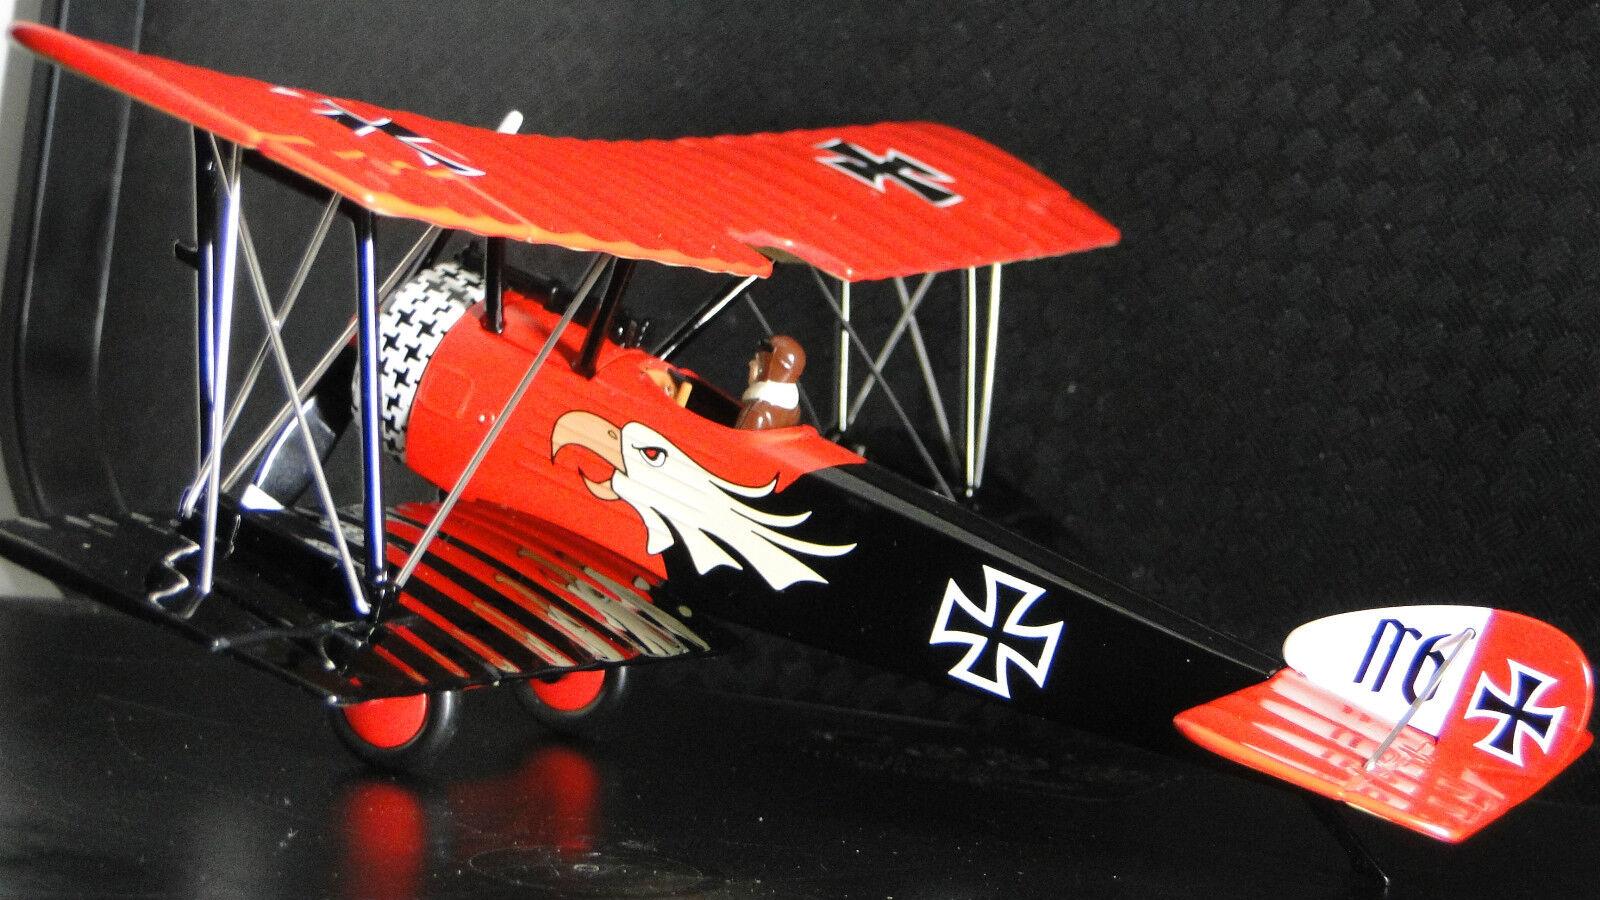 Red Barron 1 Airplane Aircraft Metal Metal Metal Diecast Model Vintage Antique War Bird 48 b765ef